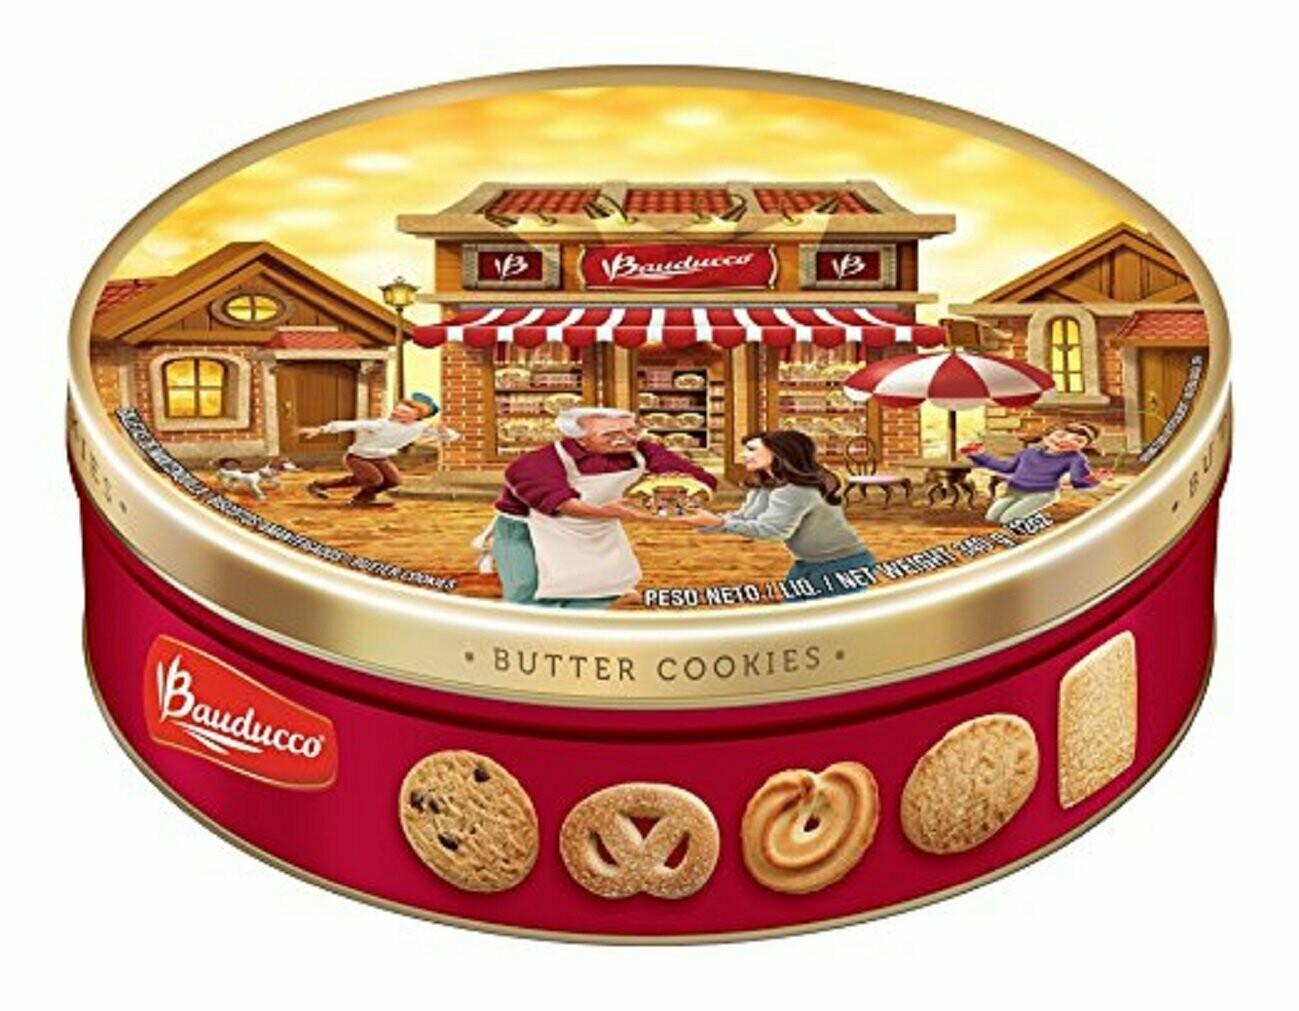 * Bauducco Butter Cookies Tin 12 Ounces